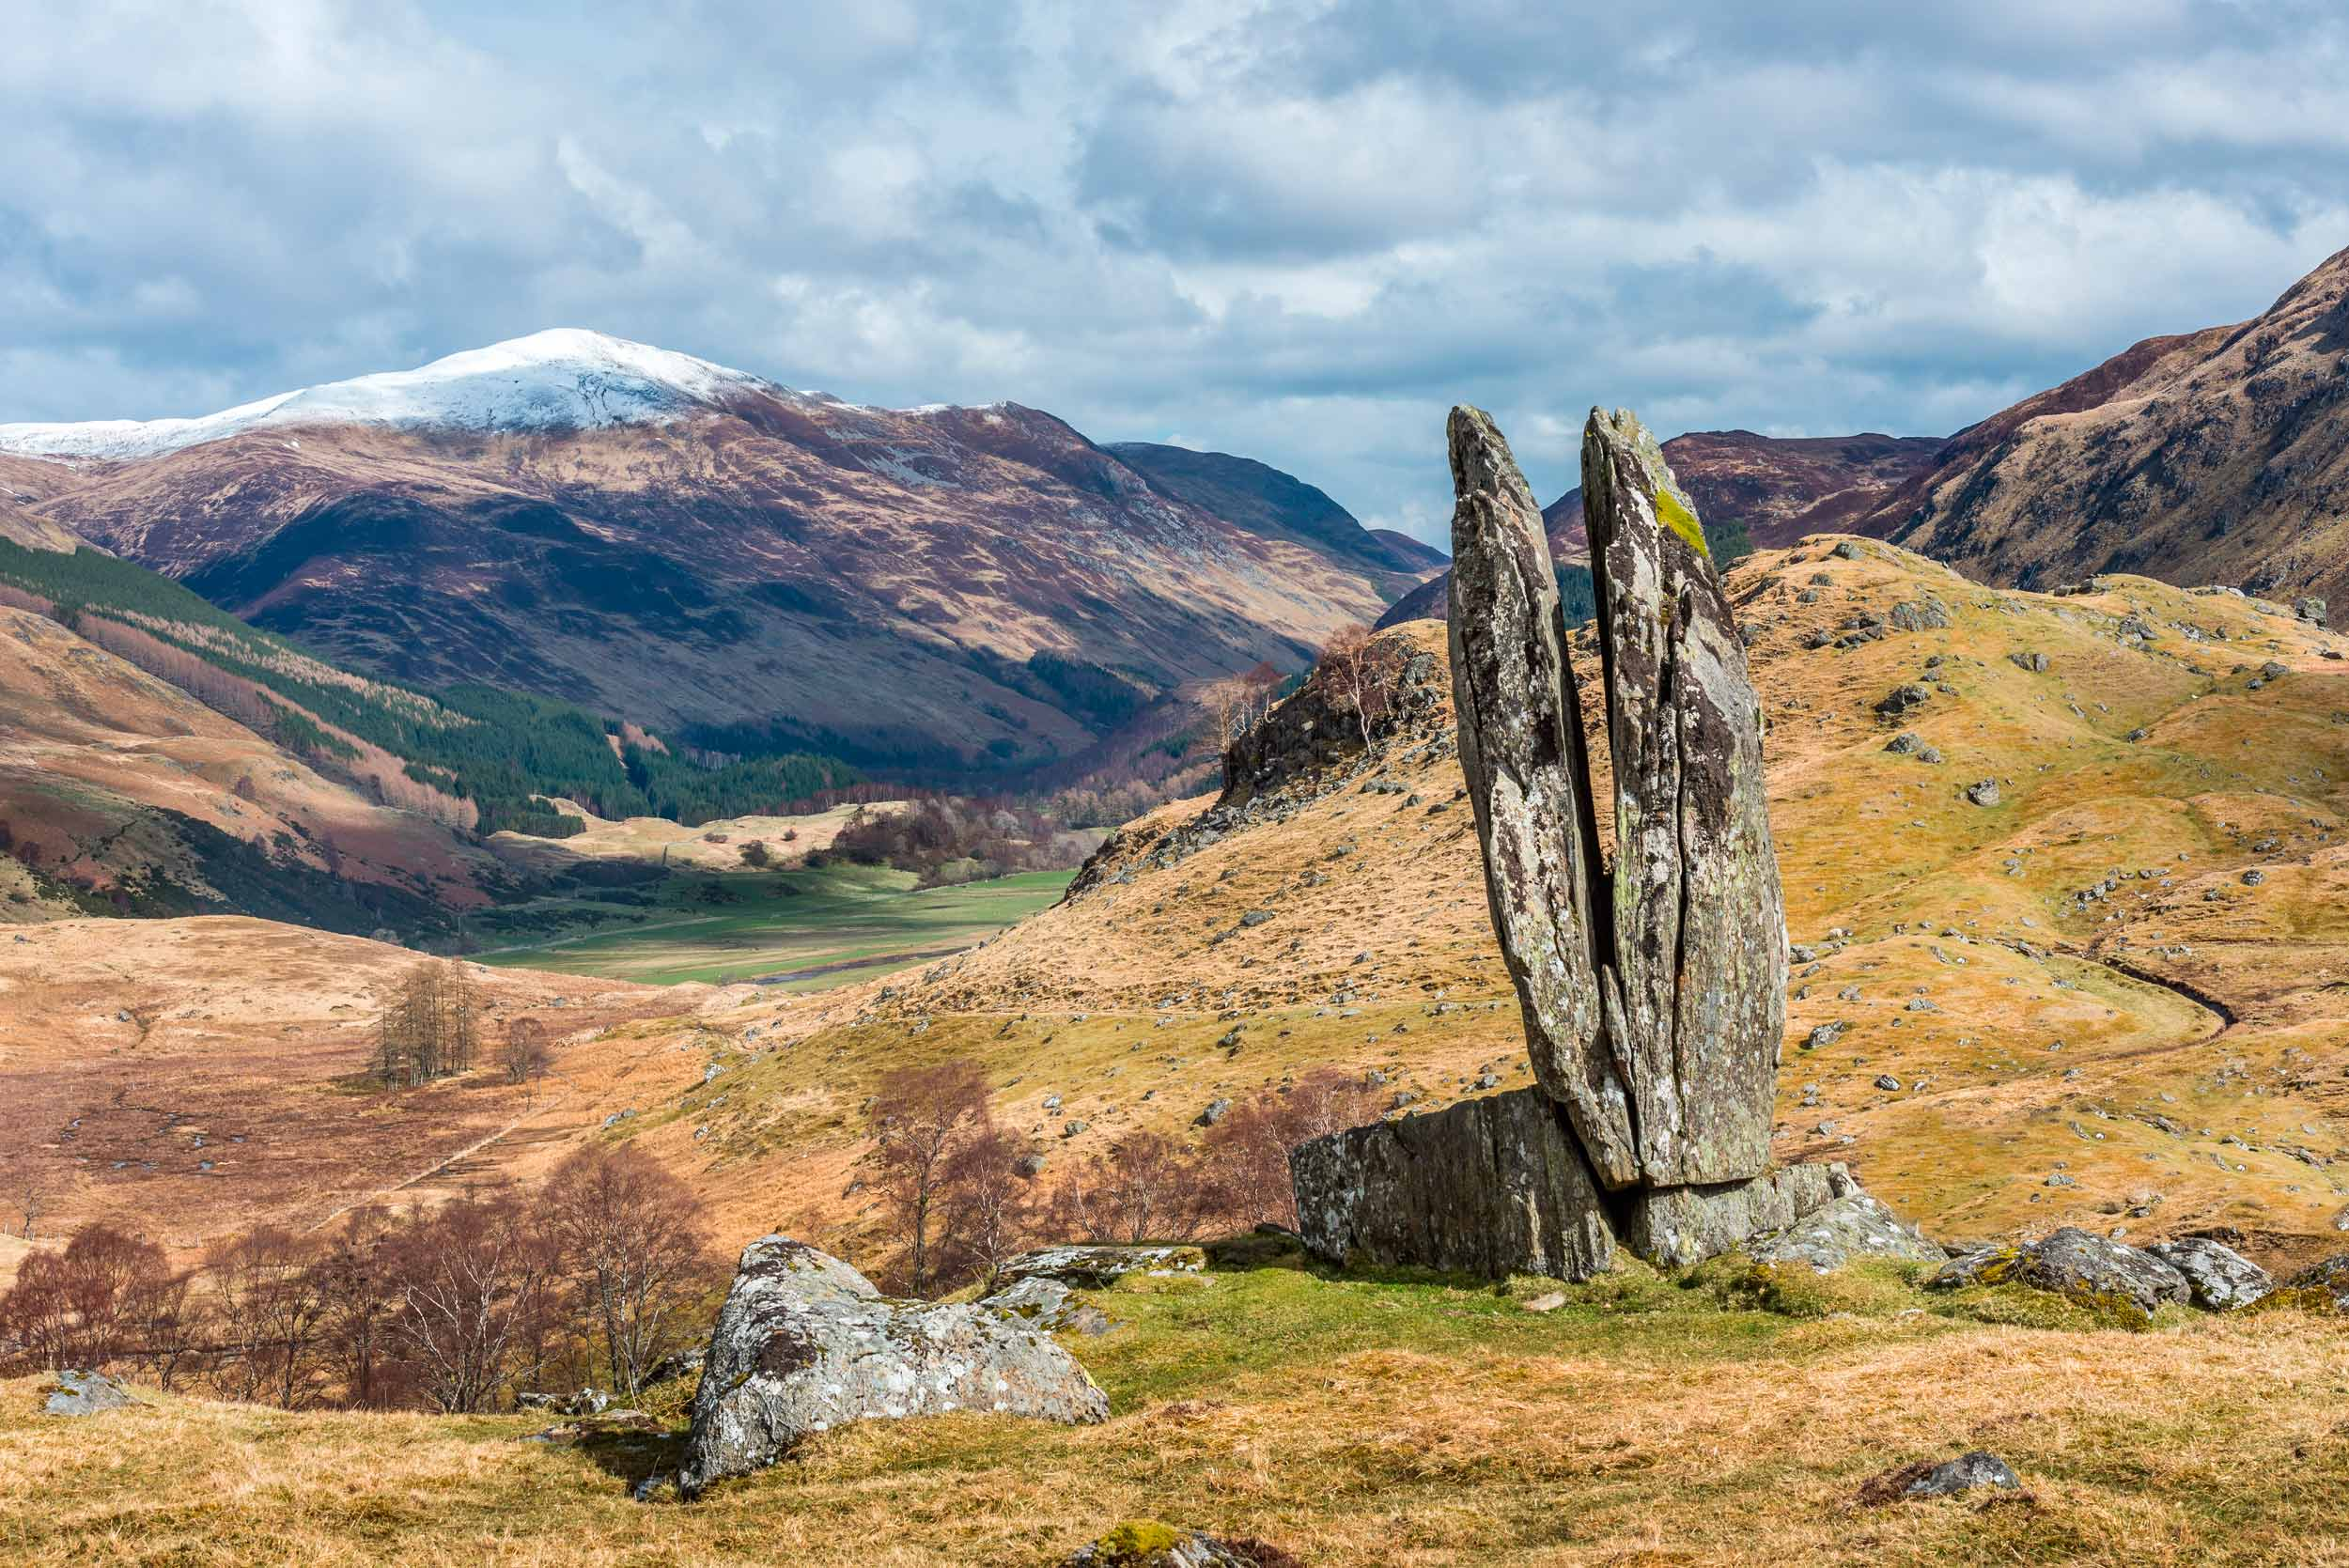 The Praying Hands of Mary,Glen Lyon, Scotland (mountaintreks/Shutterstock)